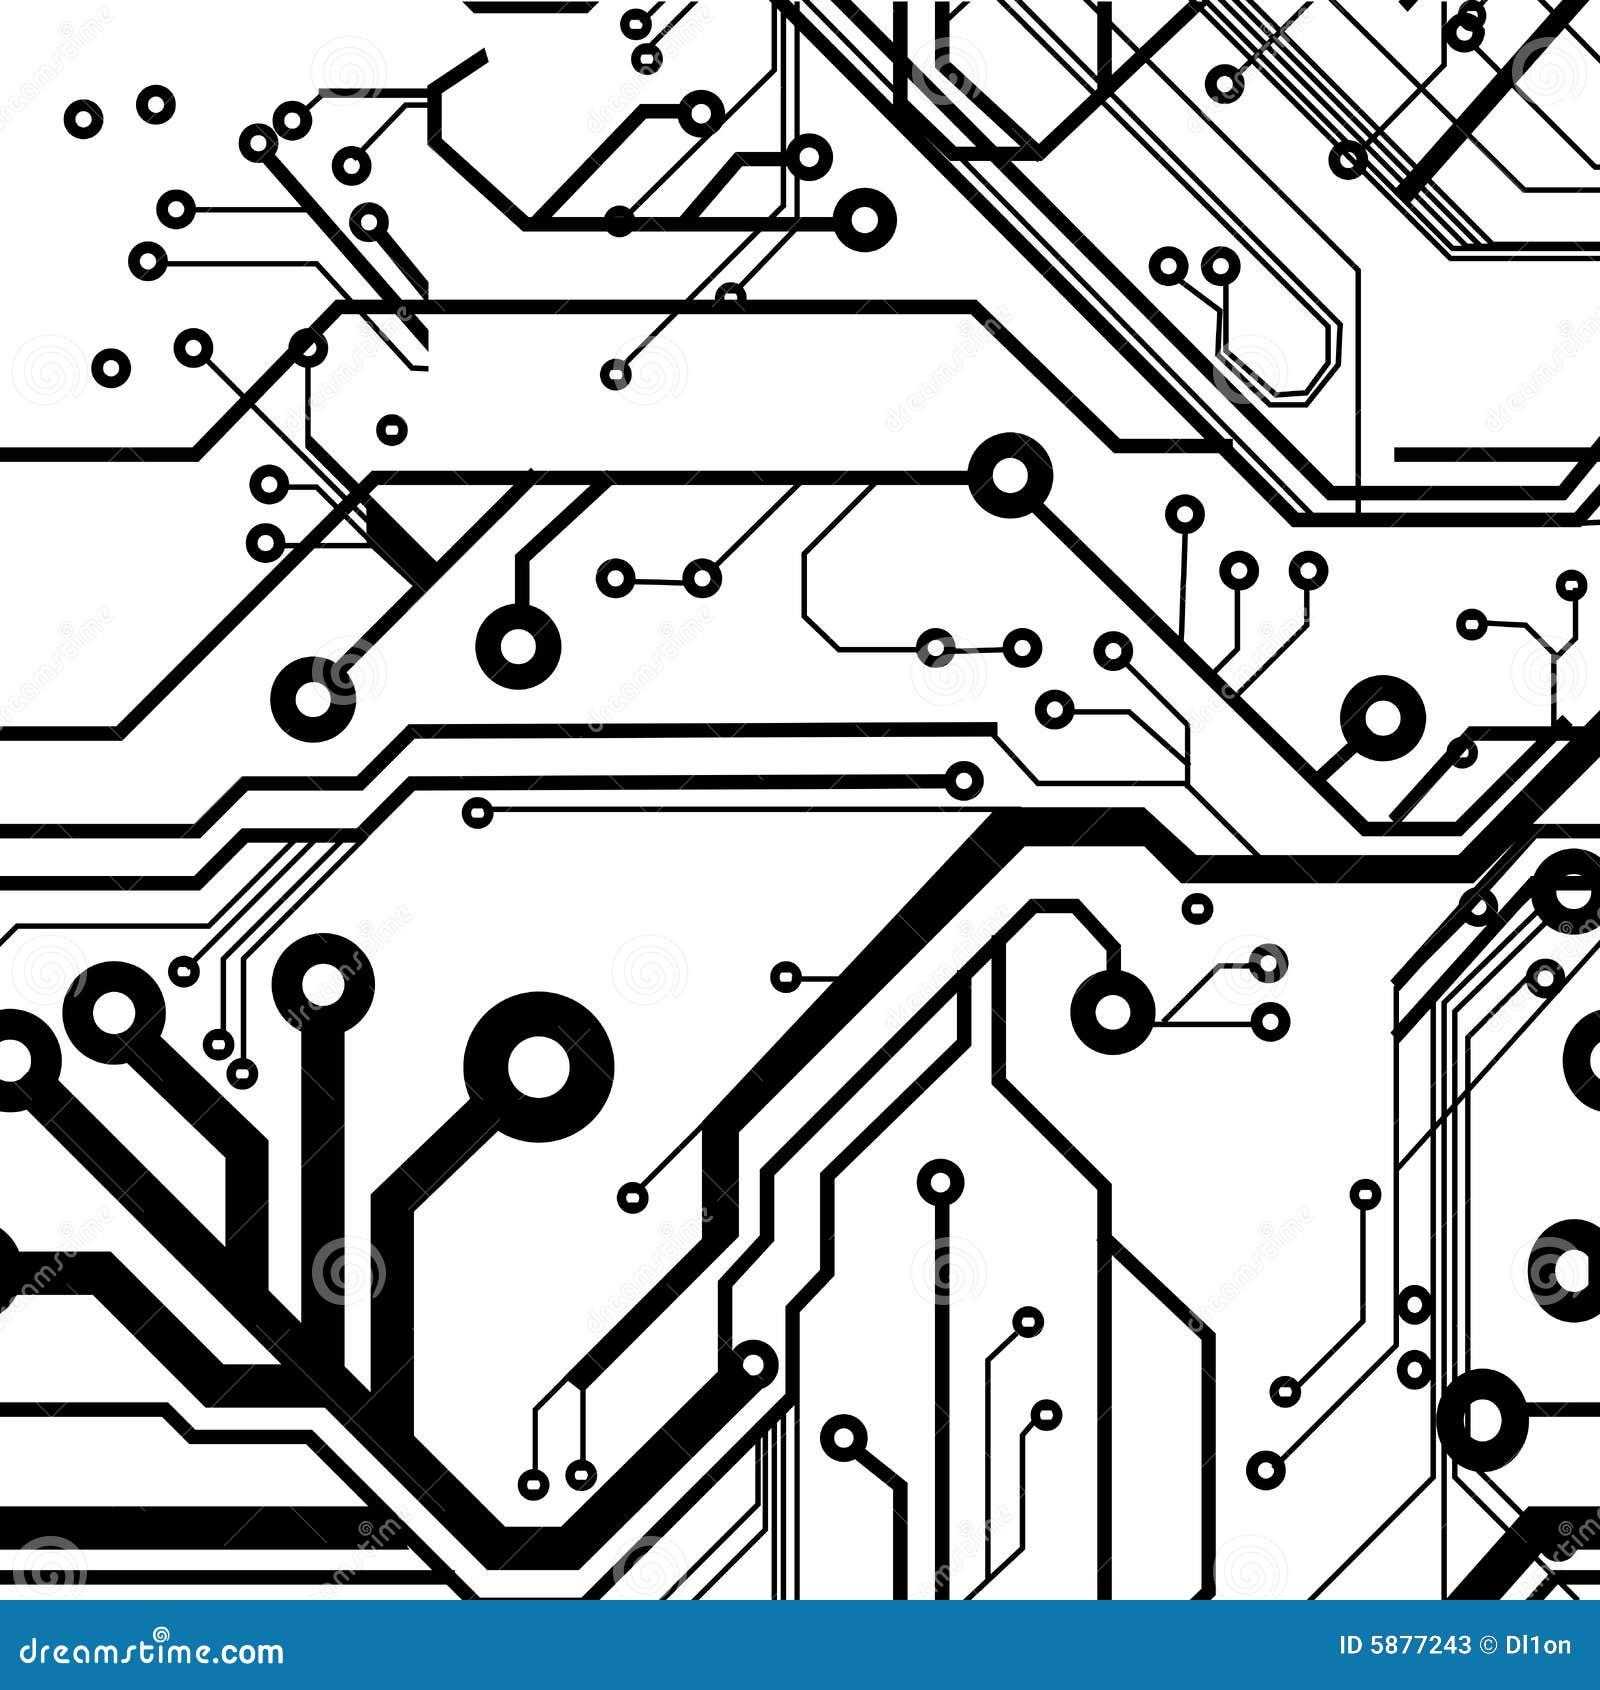 seamless printed circuit board stock vector